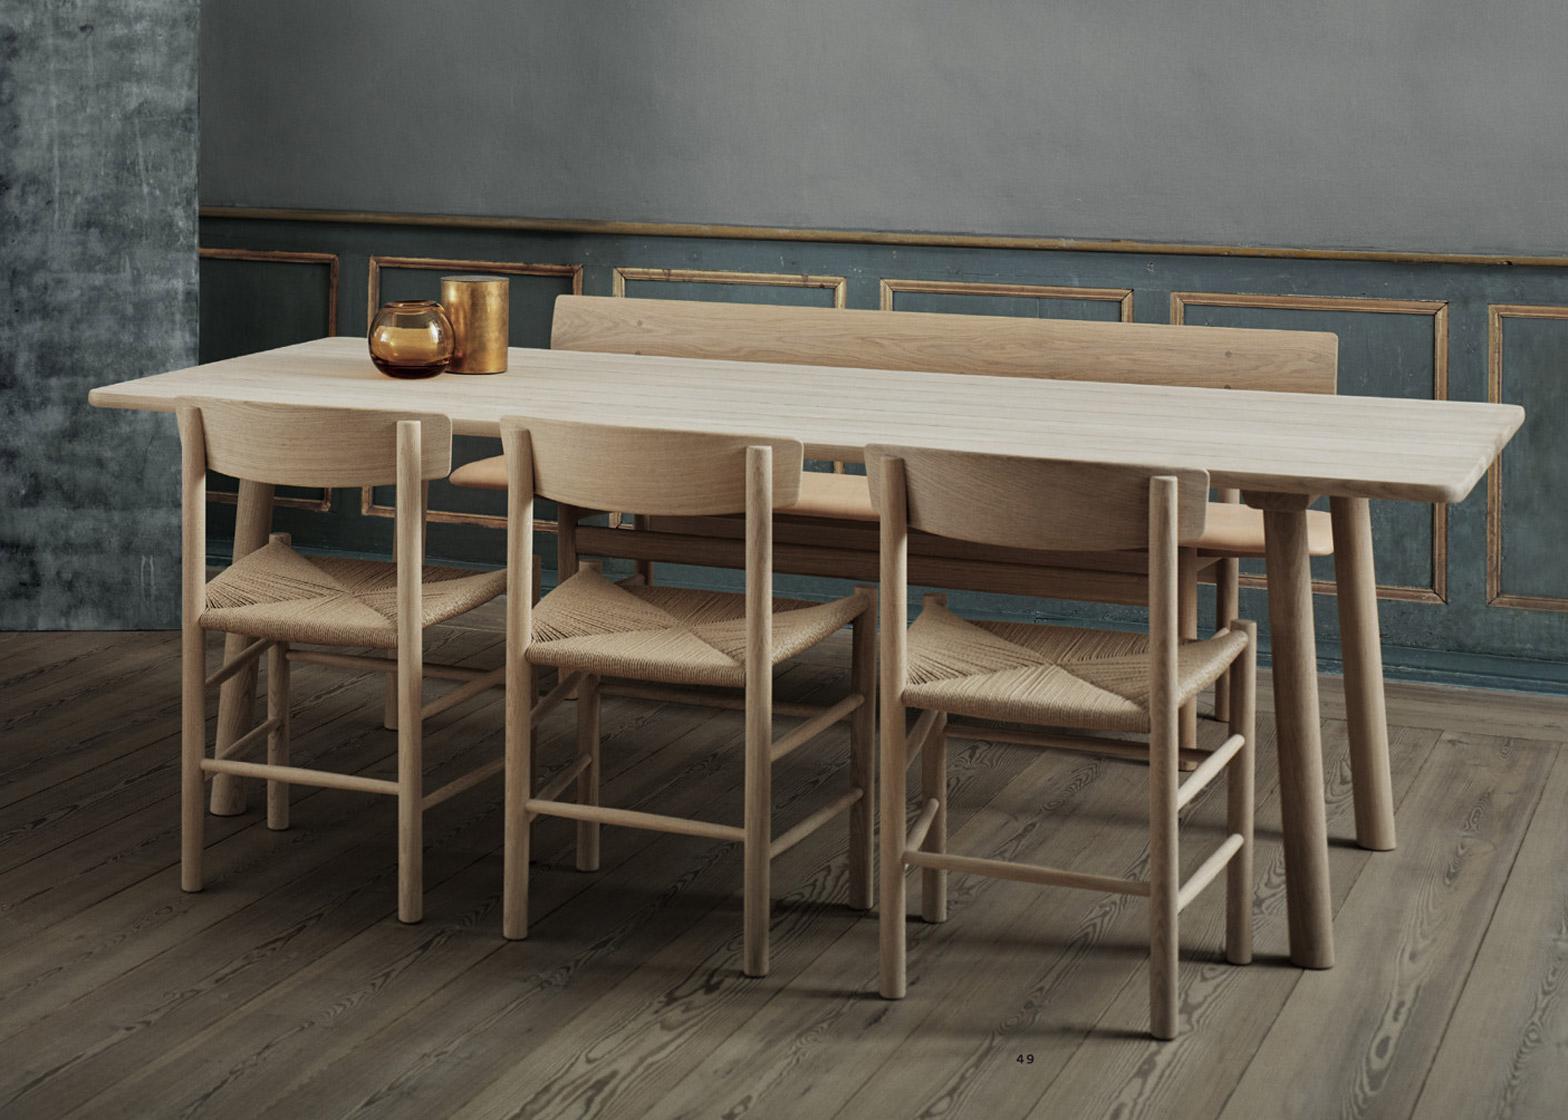 fredericia-jasper-morrison-promotion-stockholm-furniture-fair_dezeen_1568_5.jpg